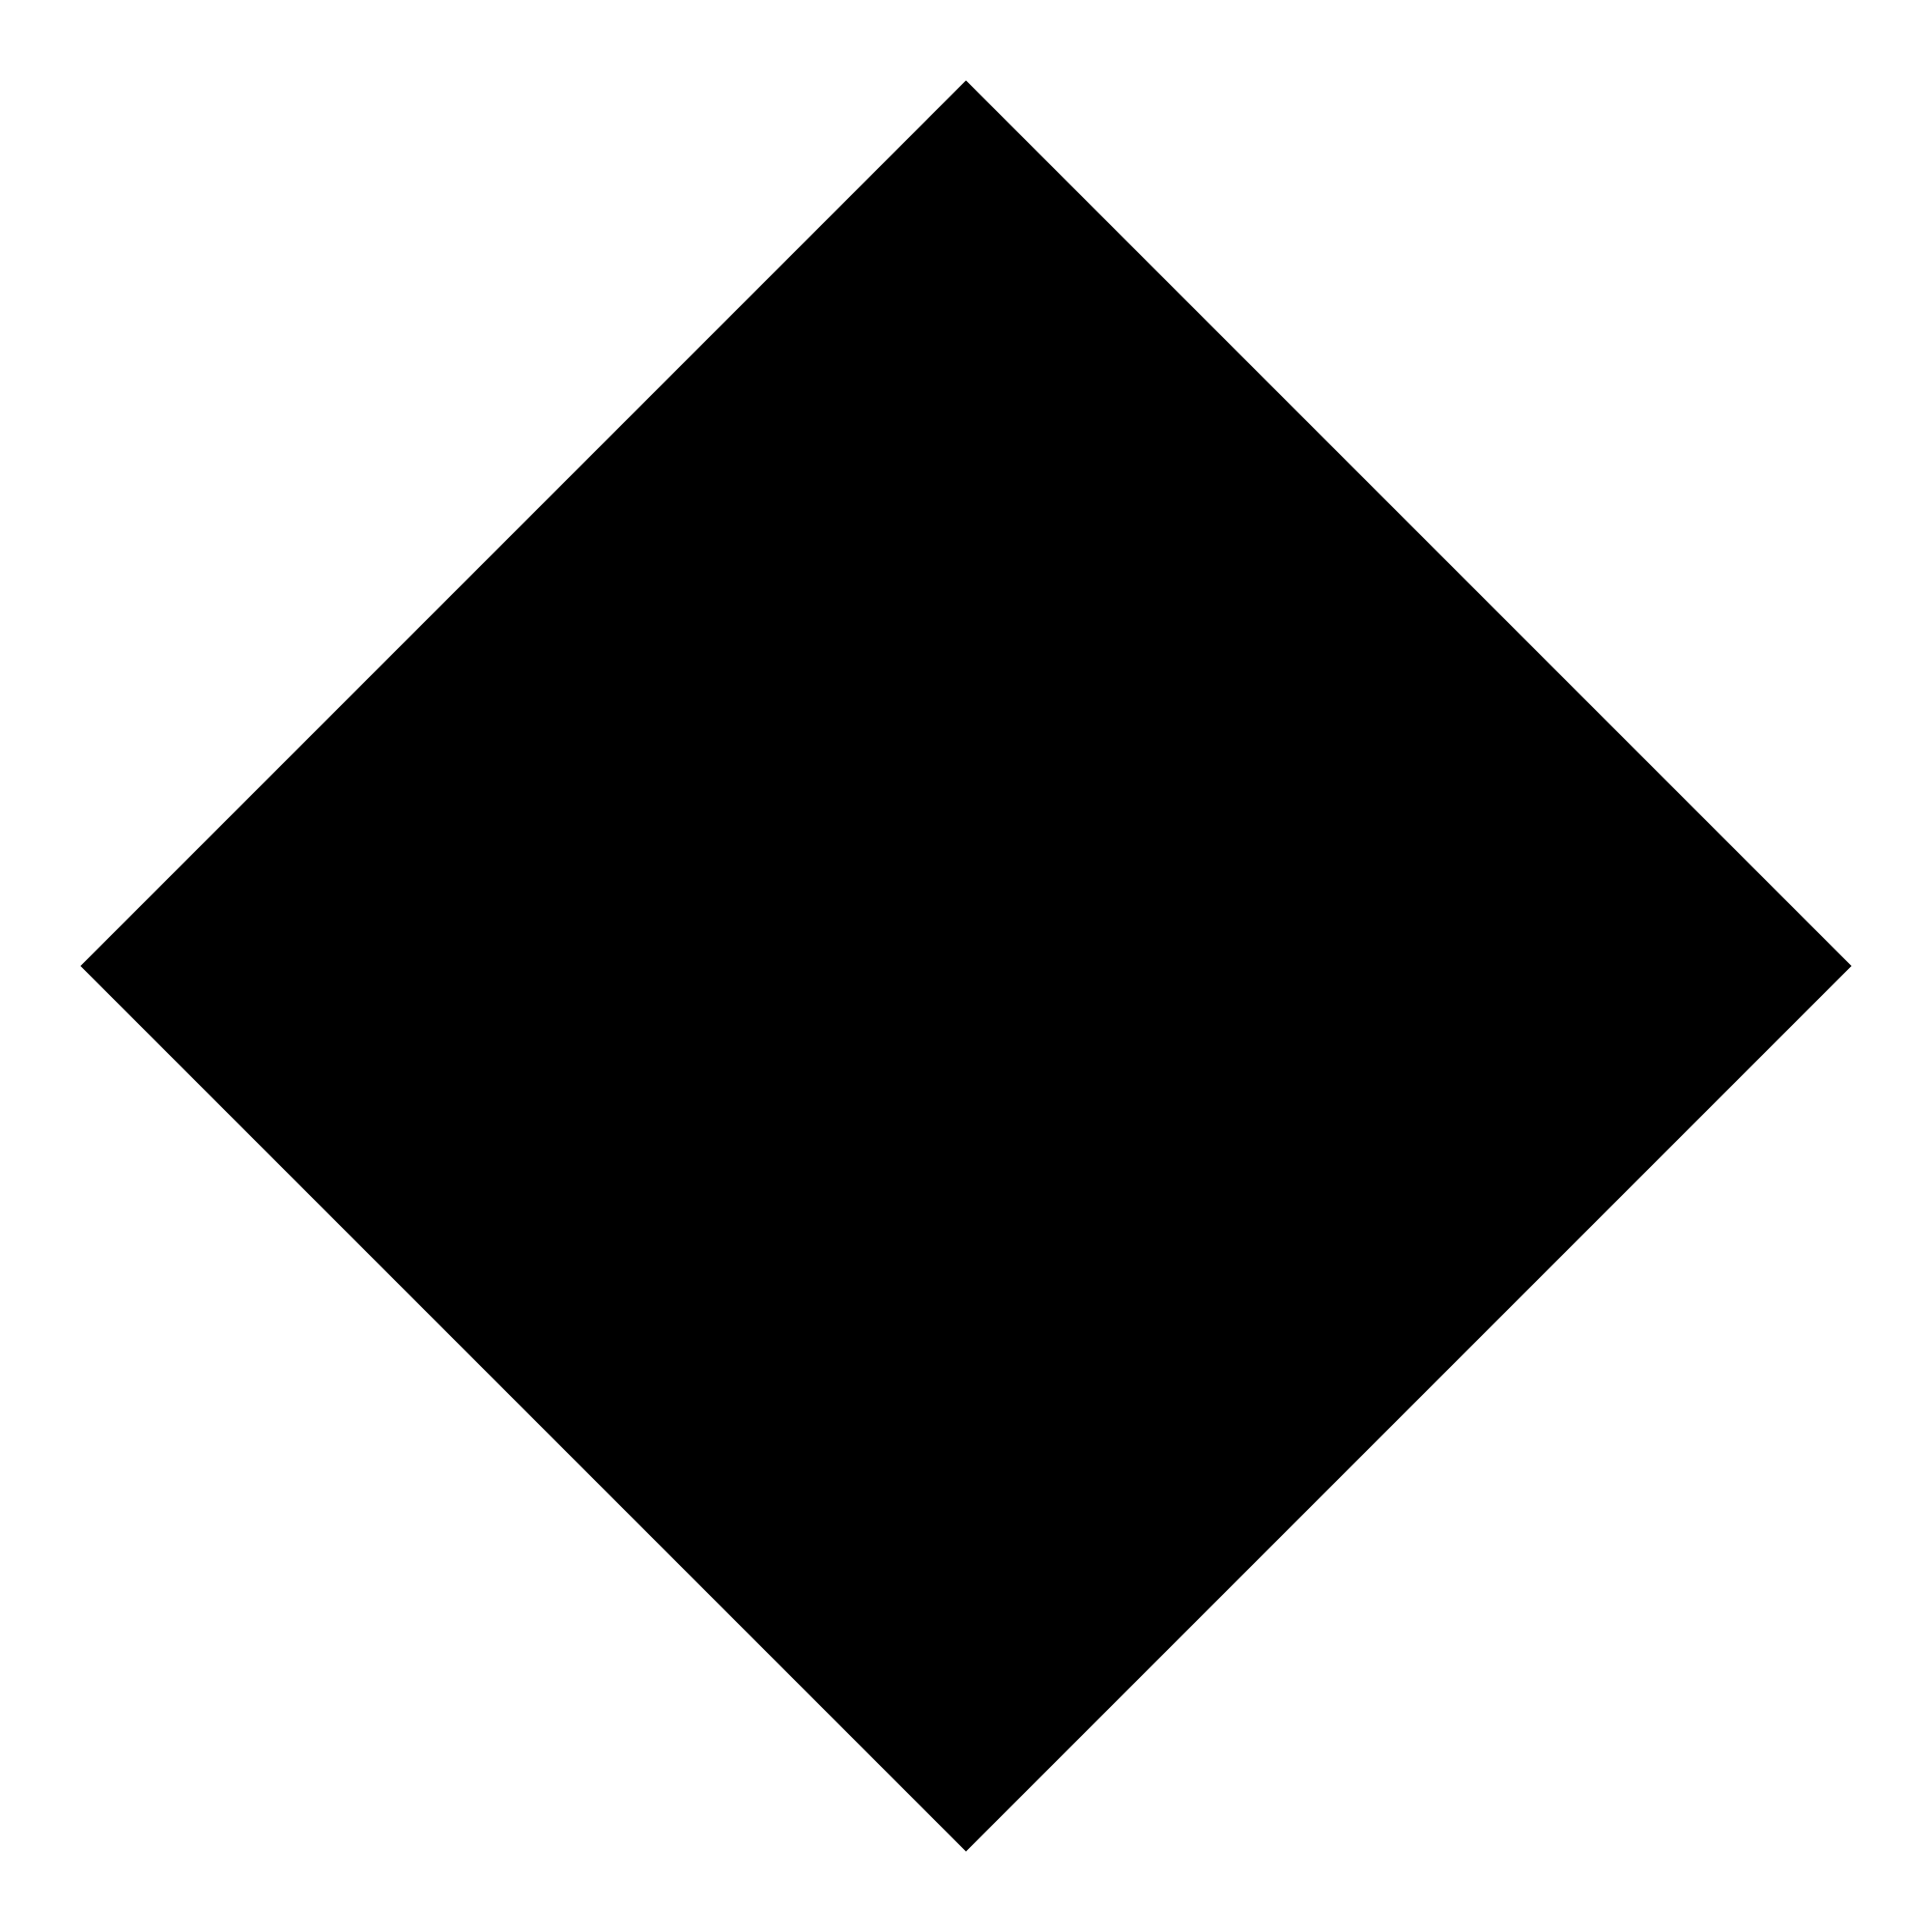 Trail clipart bike trail. File ski rating symbol